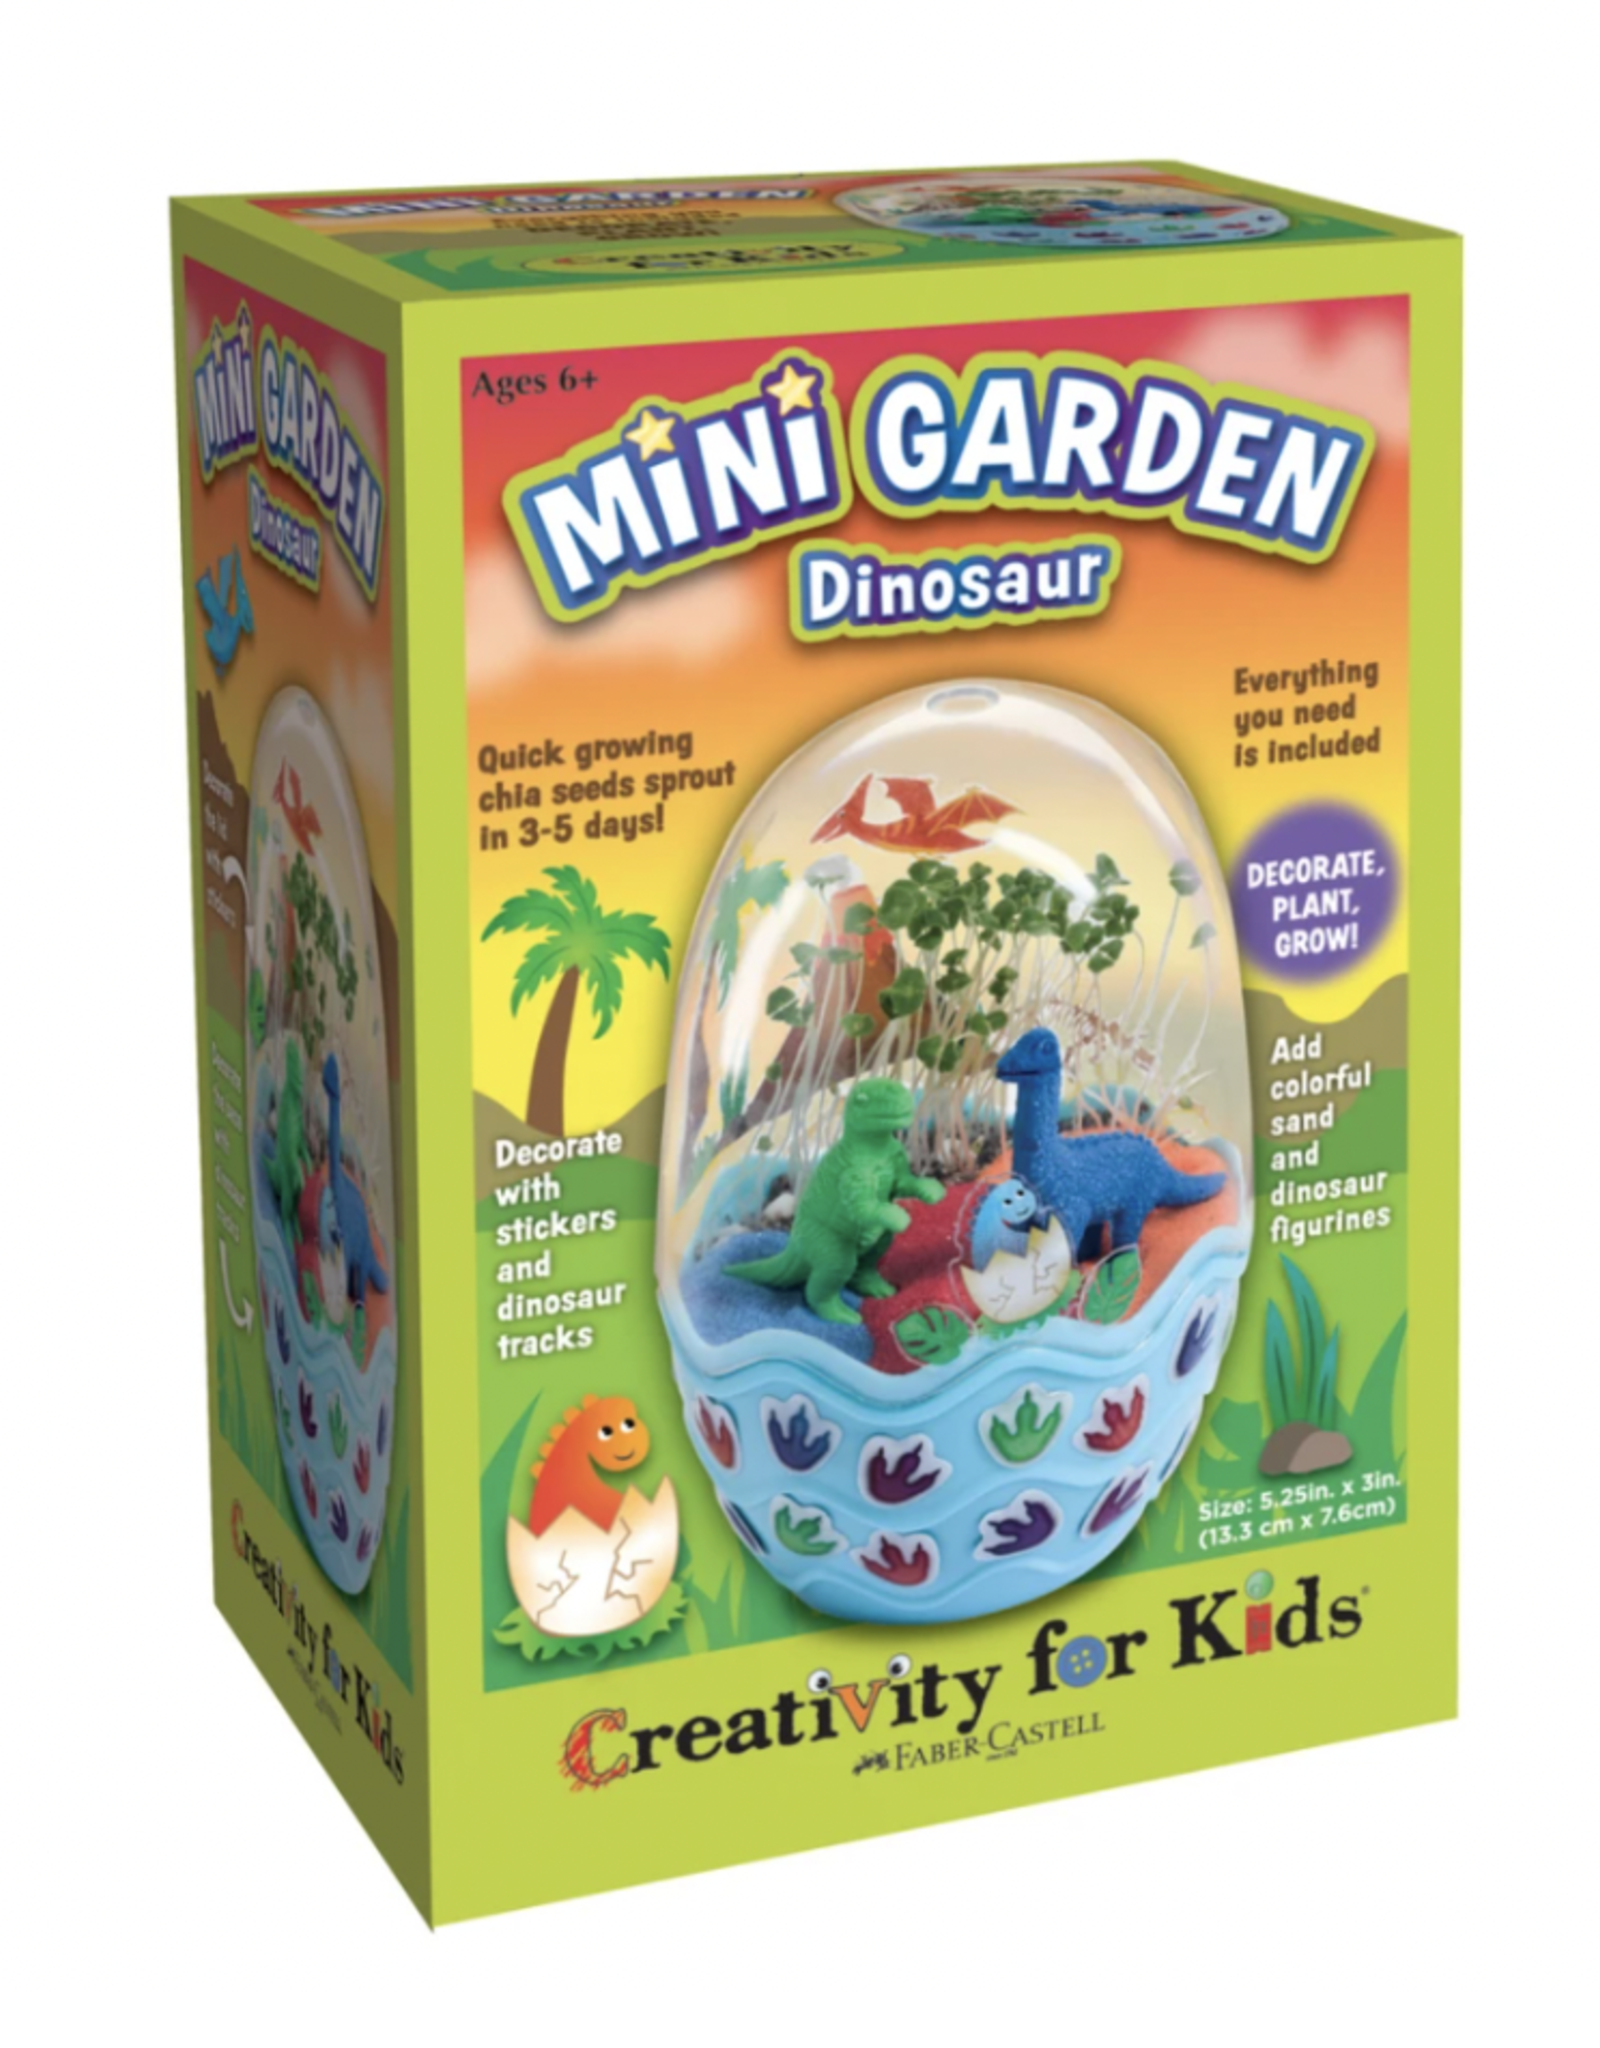 Creativity for Kids Mini Garden Dinosaur